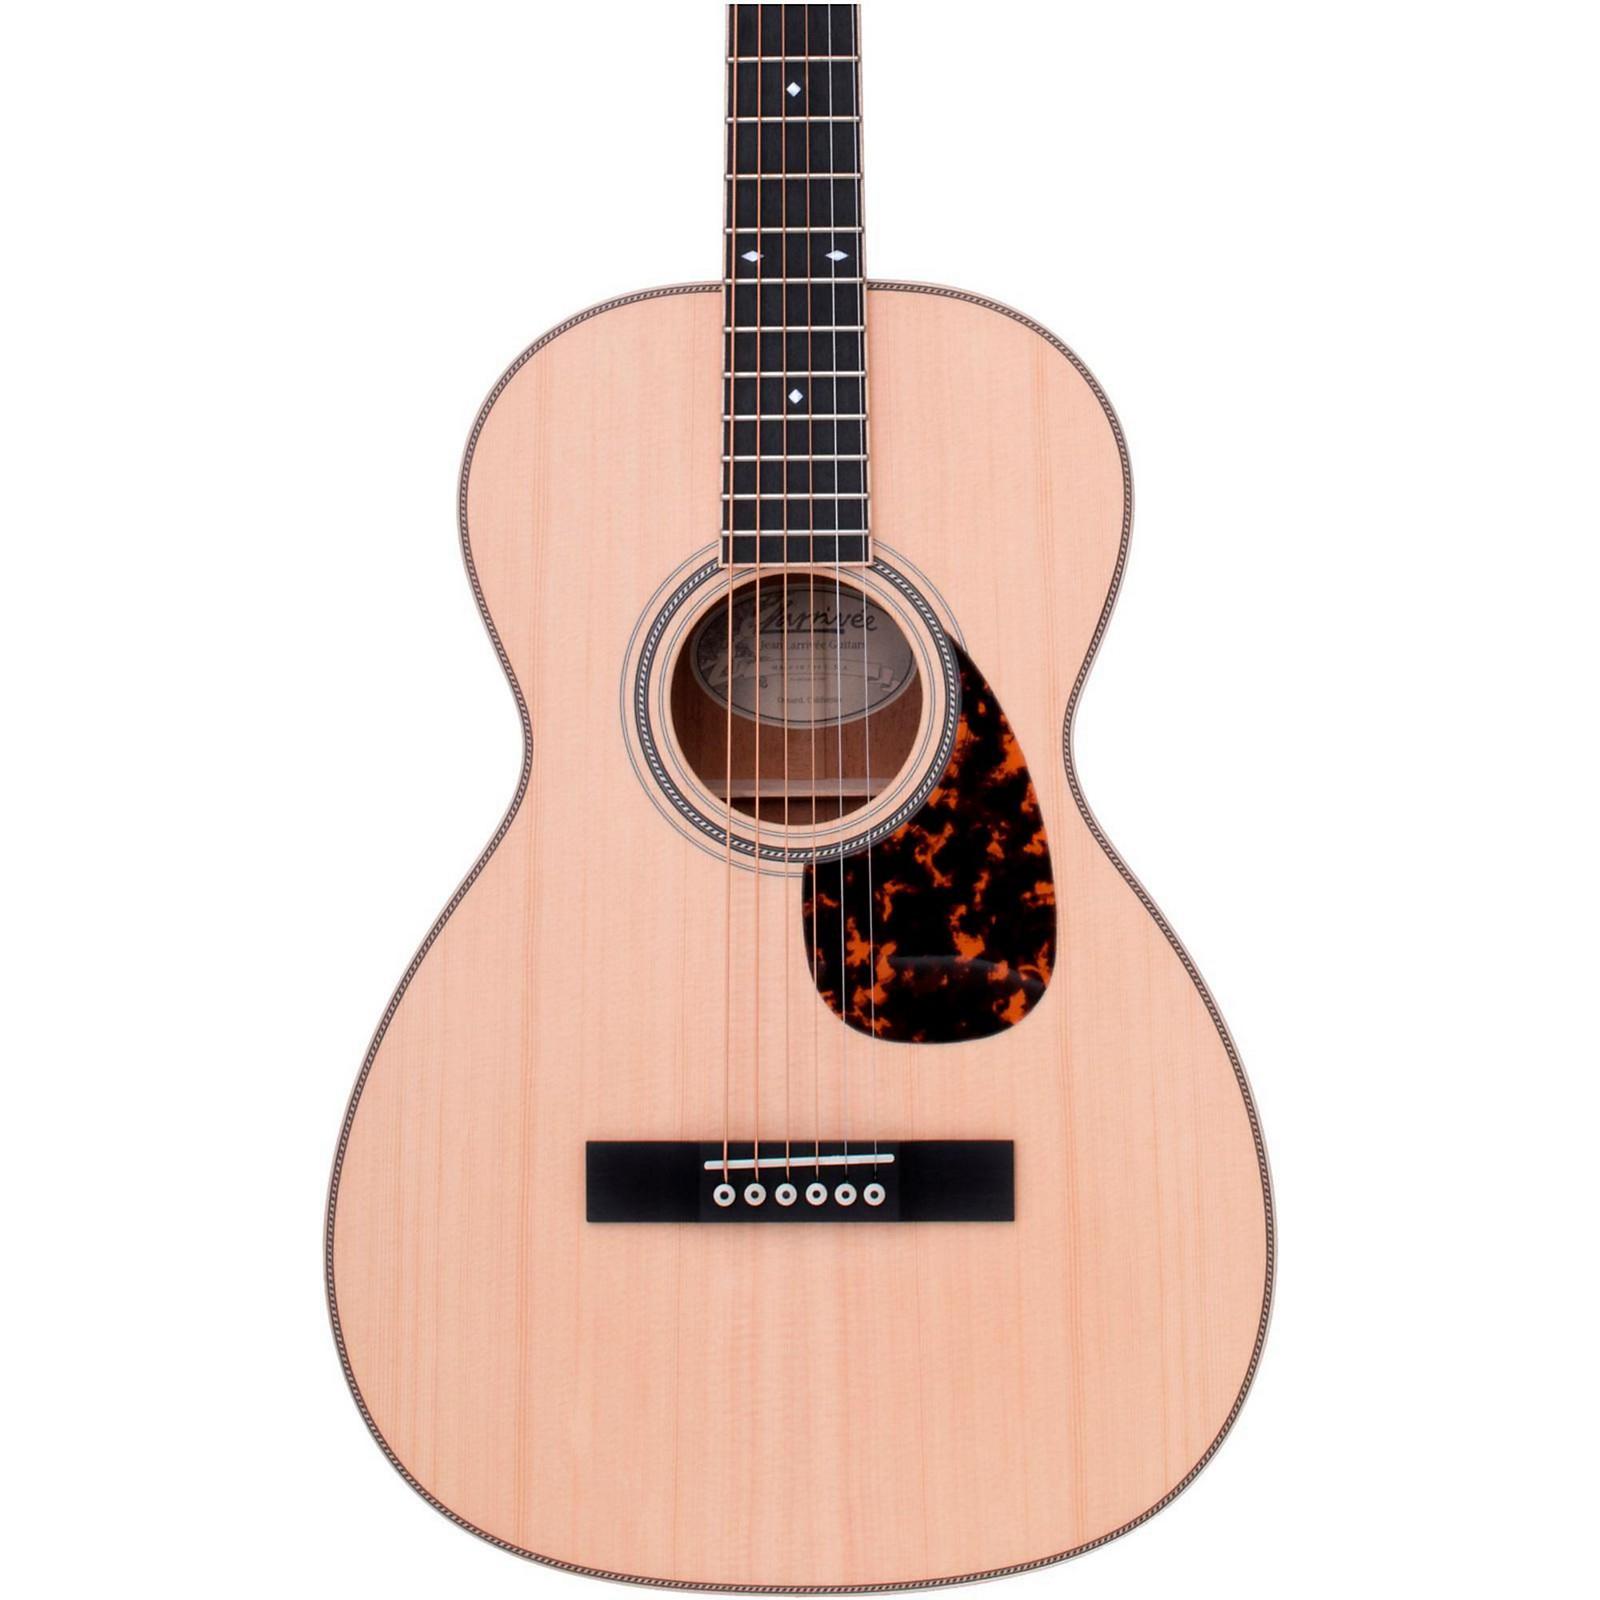 Larrivee 040MH Acoustic Guitar